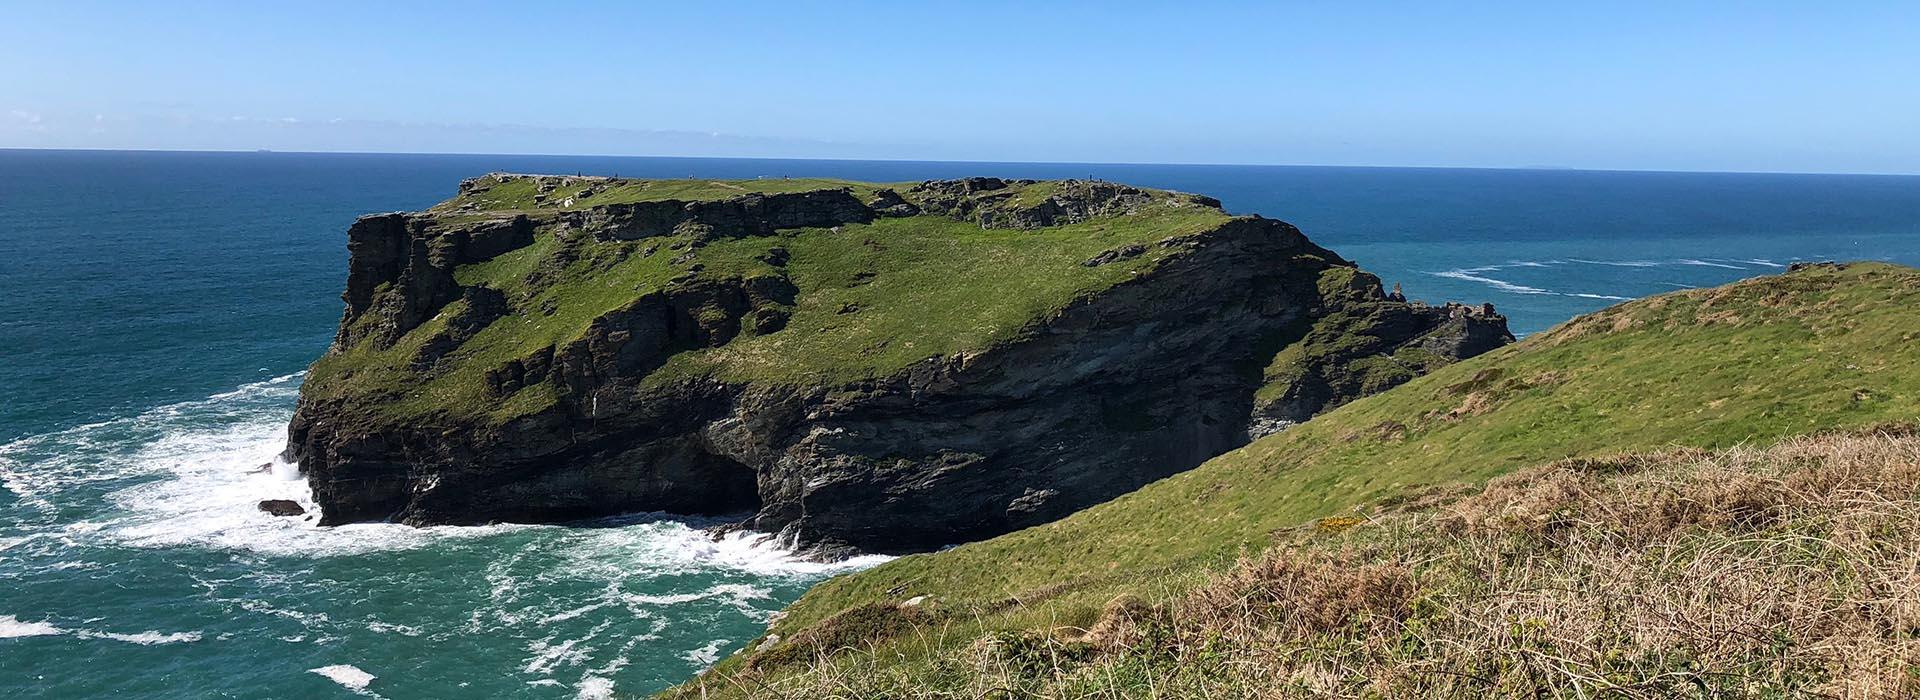 Tintagel castle island